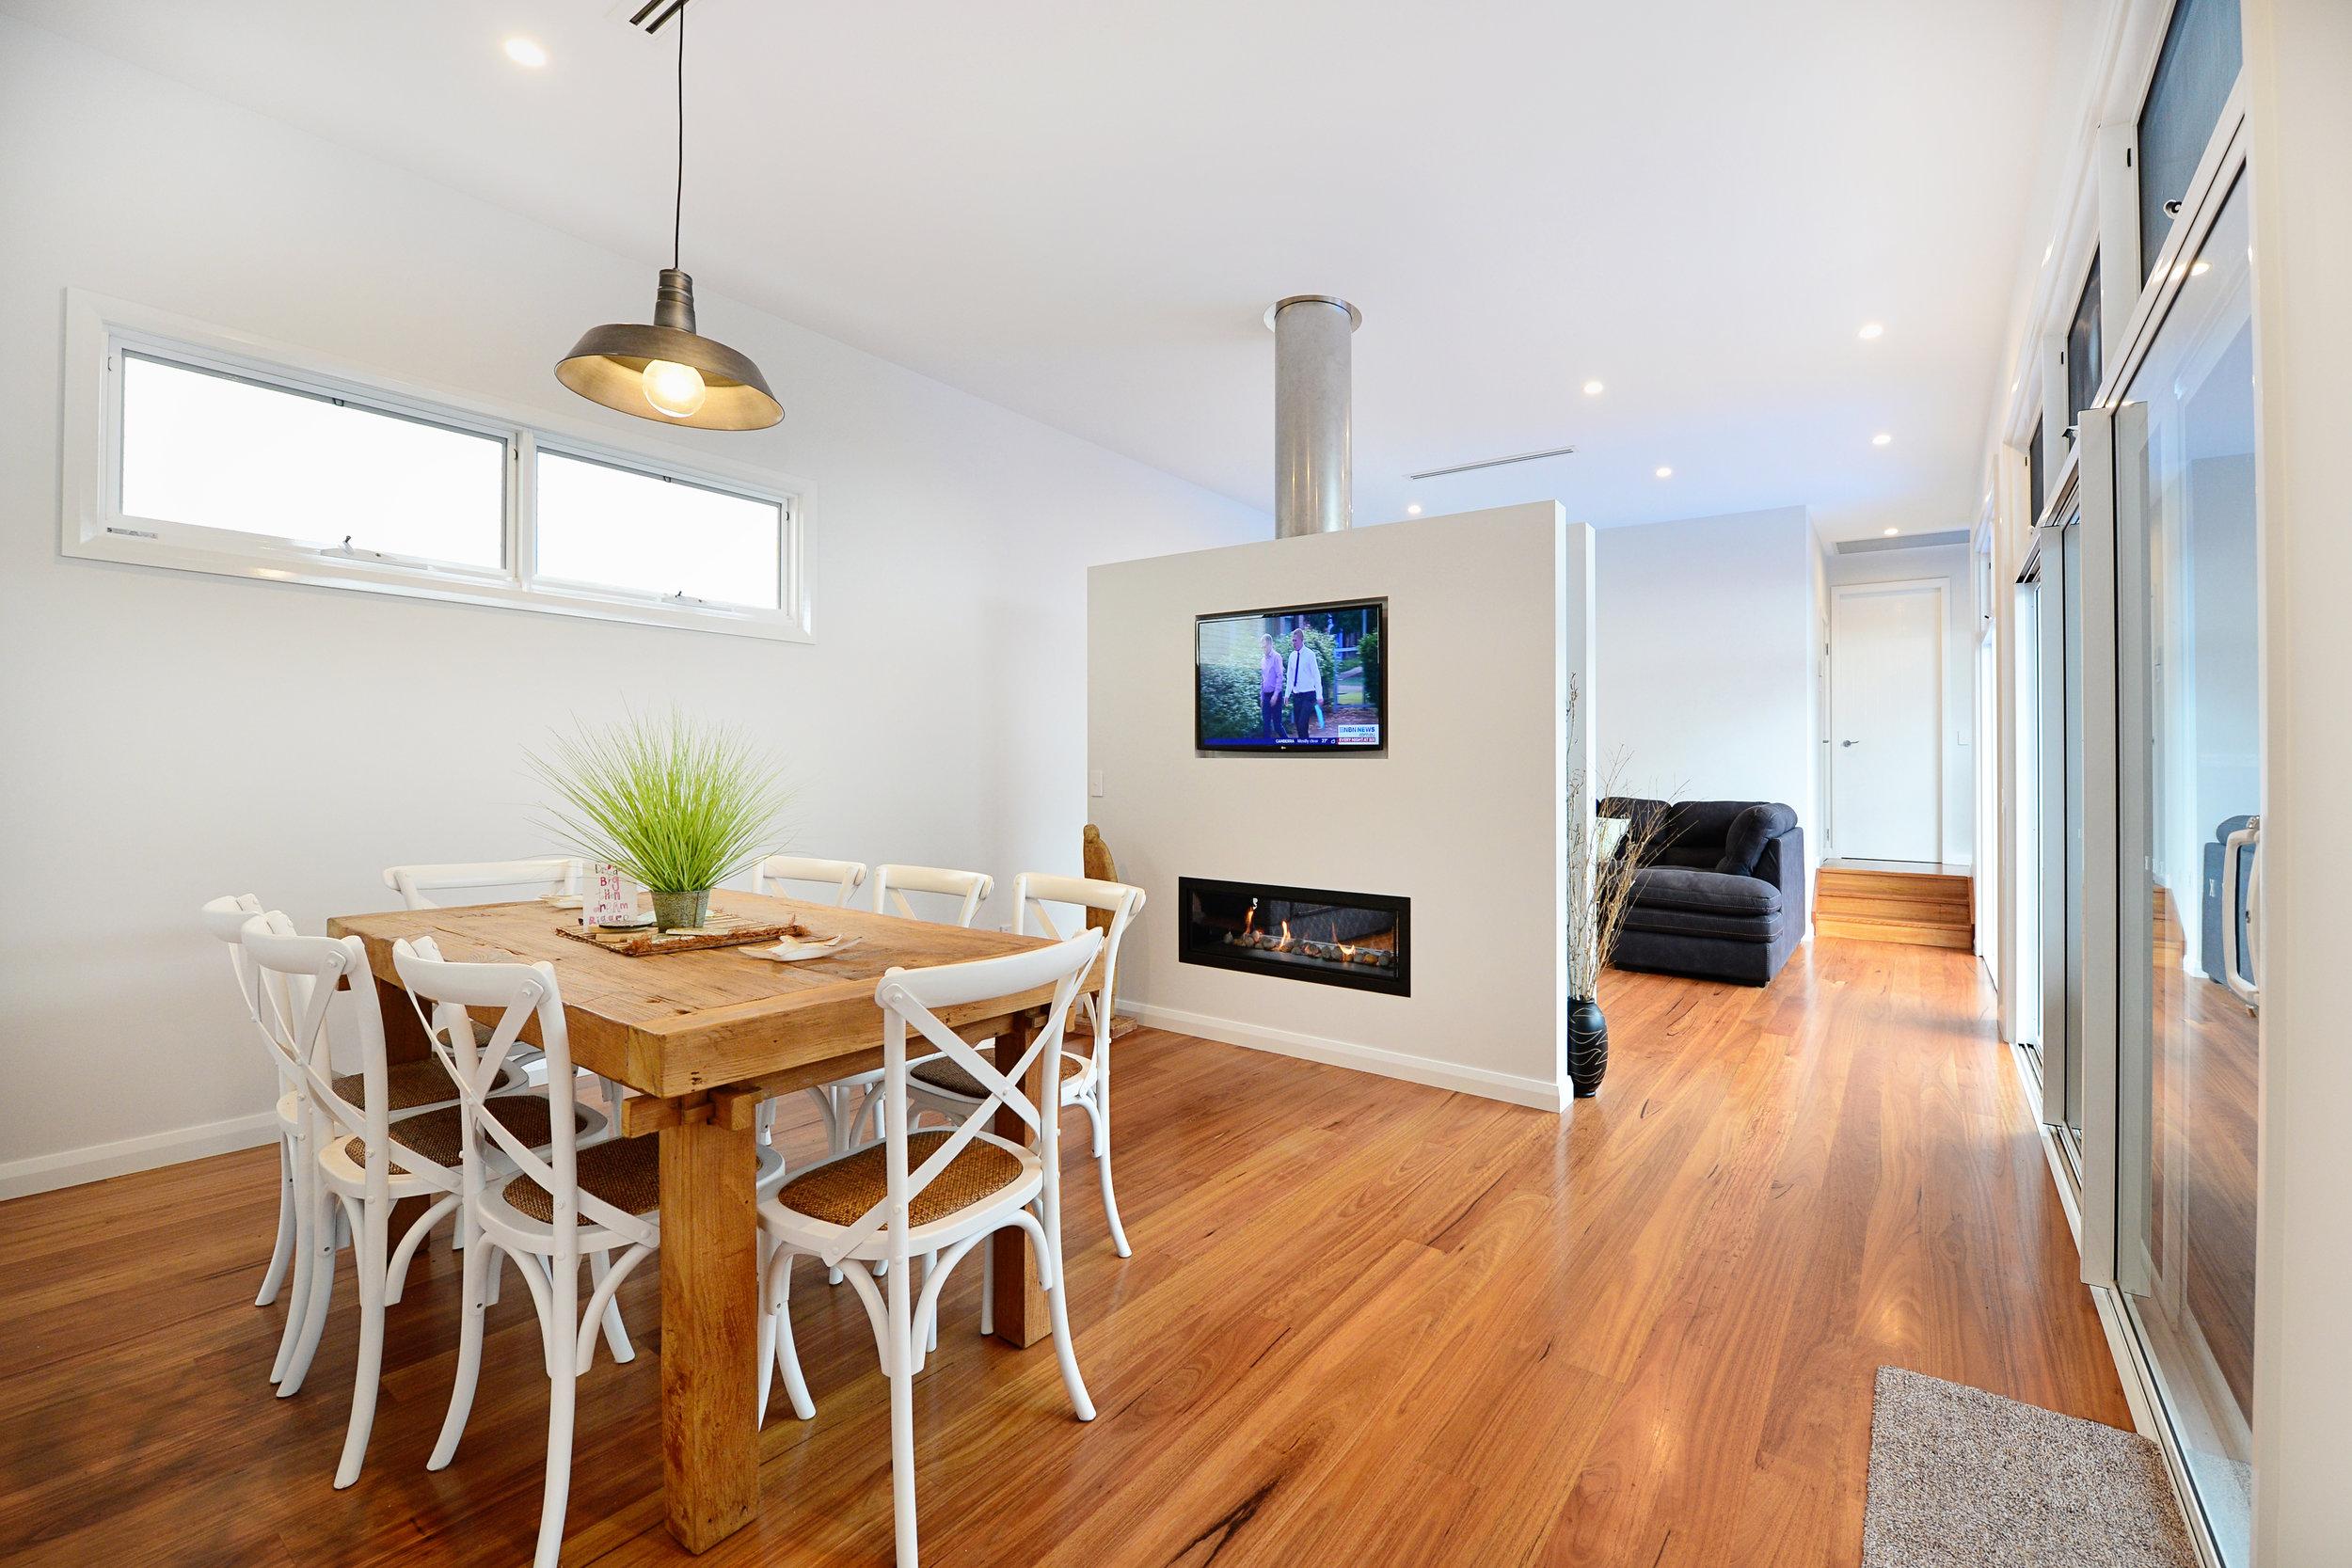 Love Shacks / Beach Shacks modern double-sided fireplace.